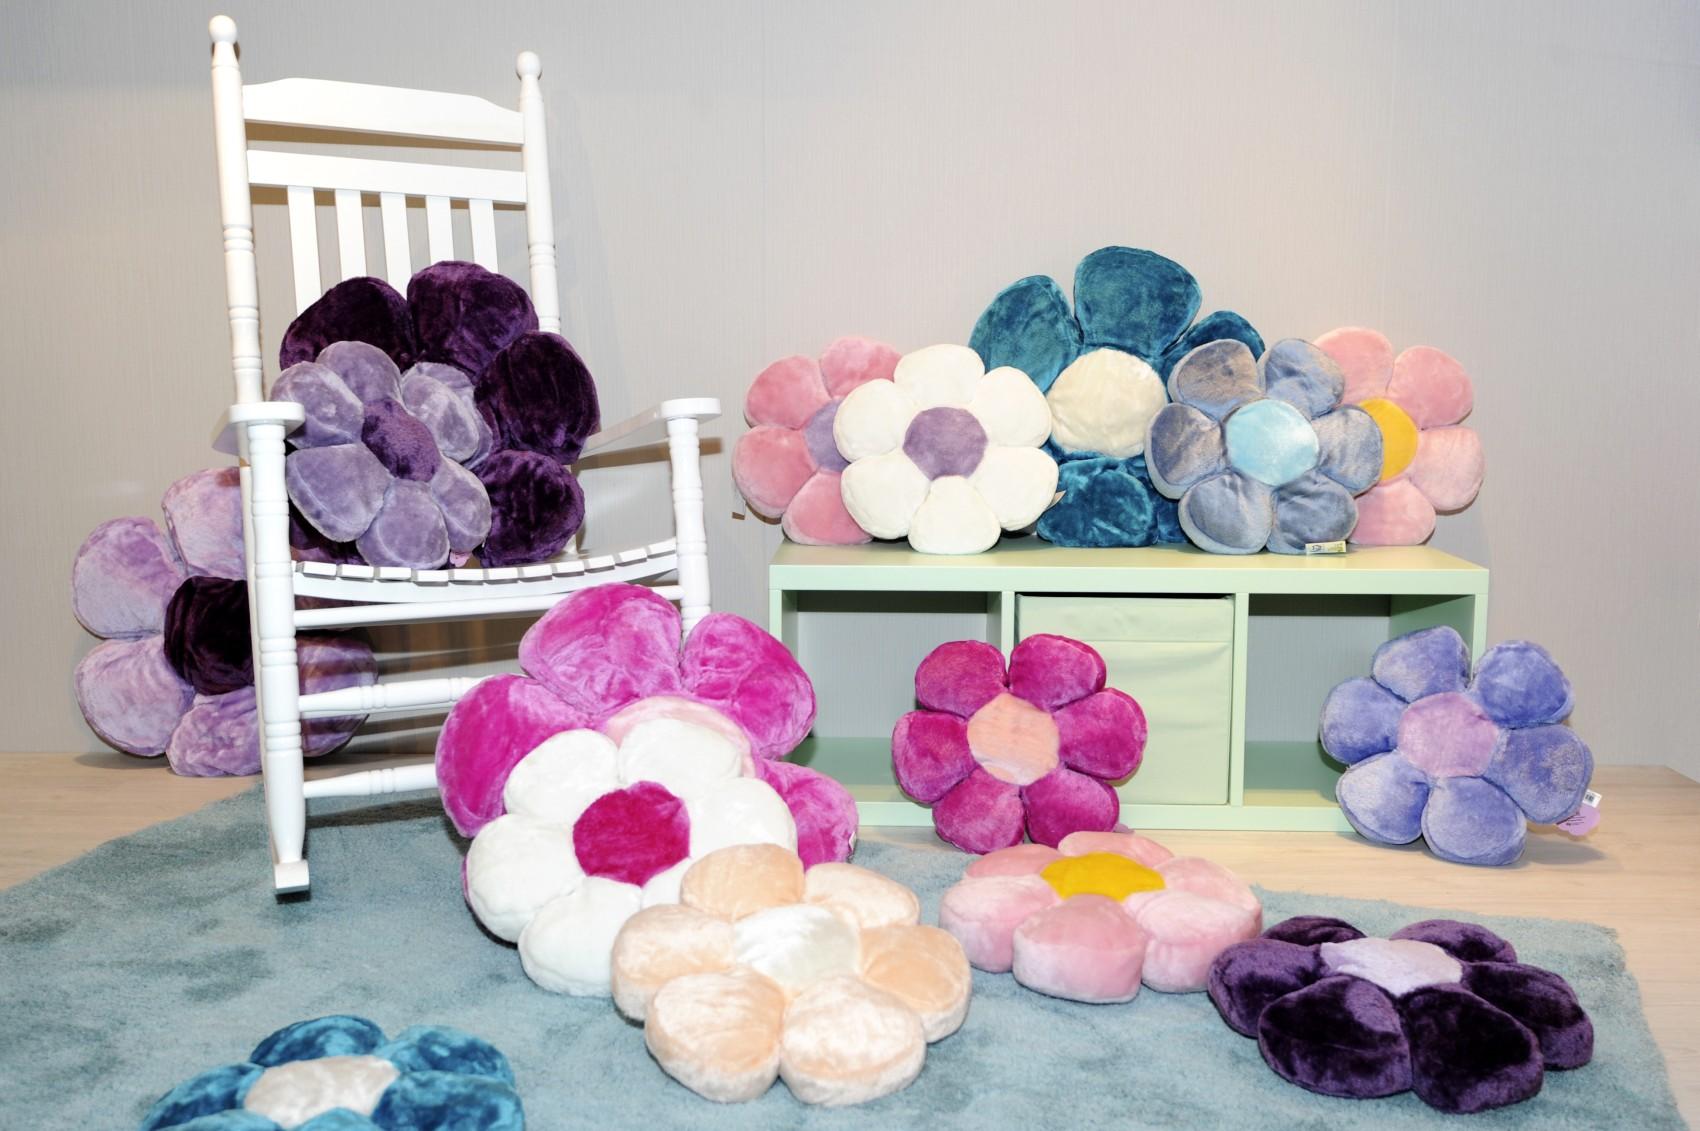 accessoires reinkemeier rietberg handel logistik ladenbau. Black Bedroom Furniture Sets. Home Design Ideas